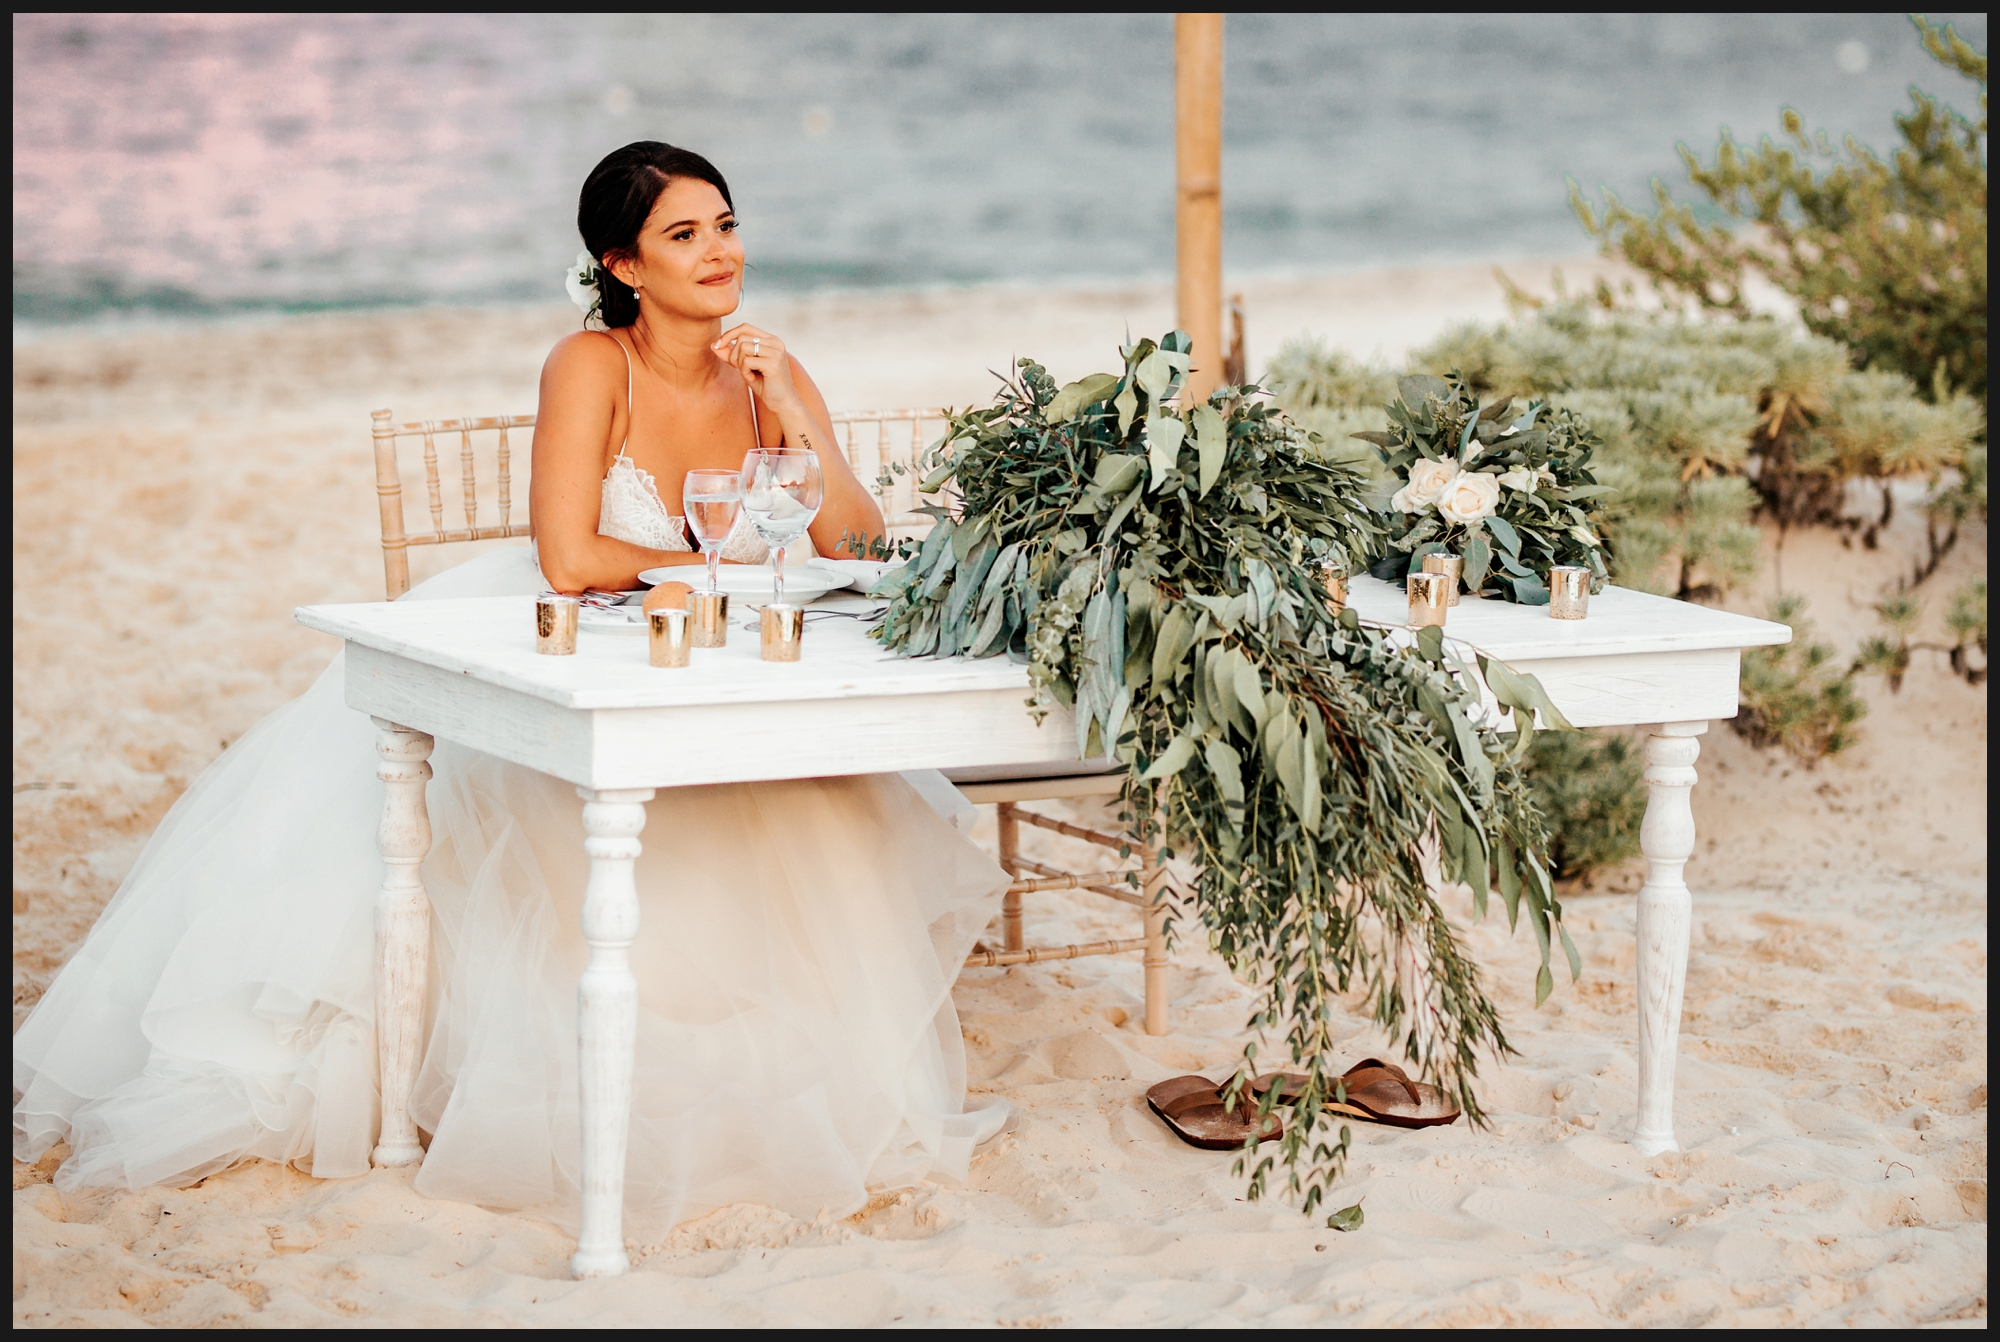 Orlando-Wedding-Photographer-destination-wedding-photographer-florida-wedding-photographer-bohemian-wedding-photographer_0546.jpg